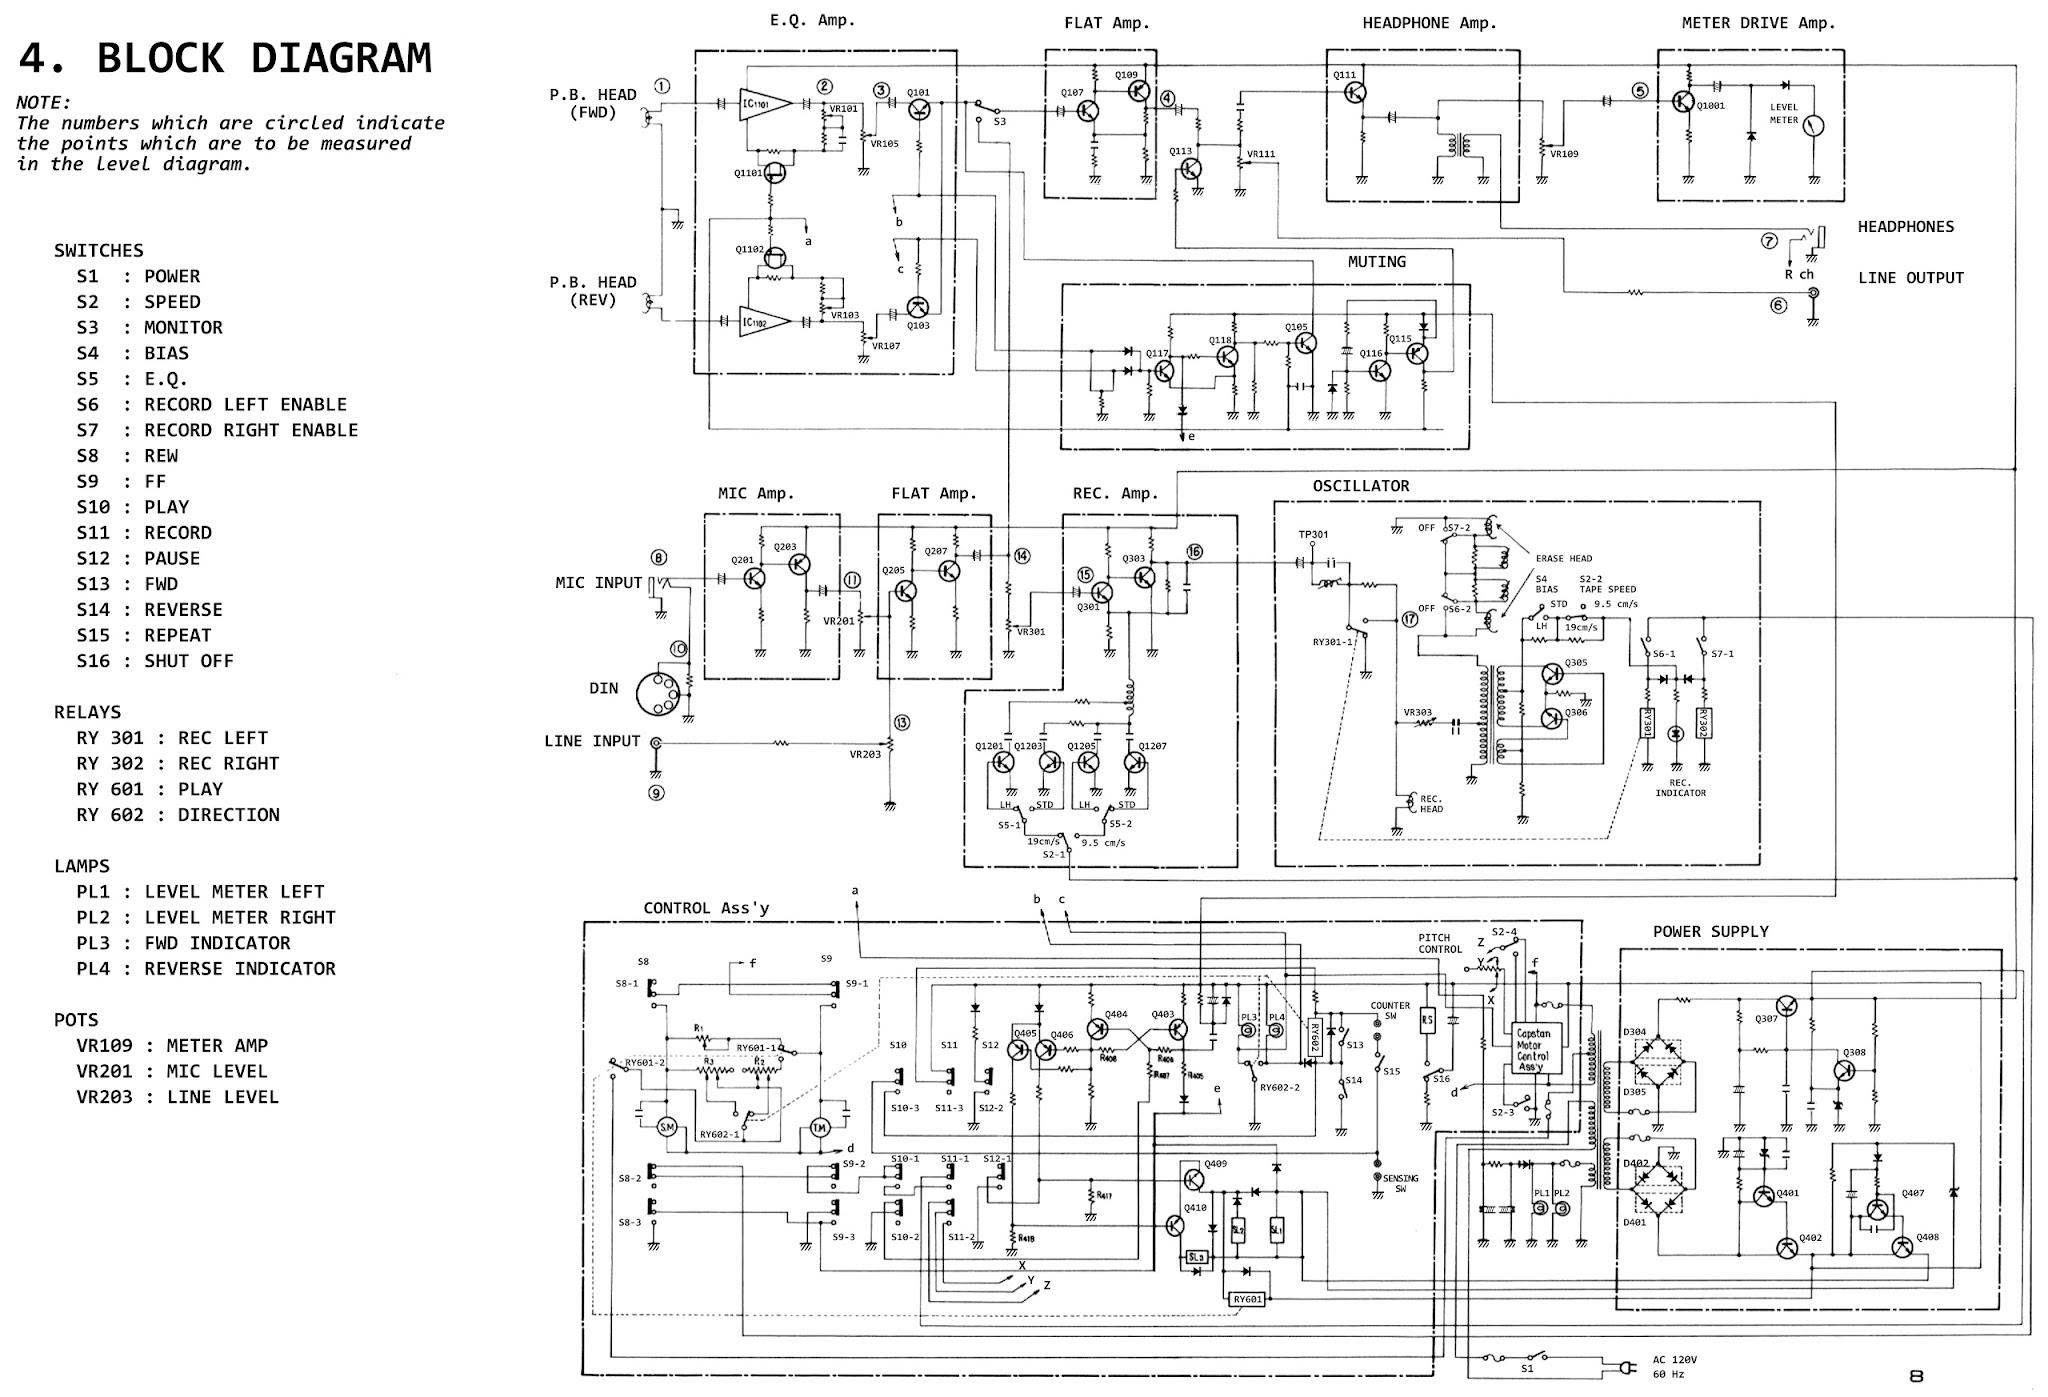 S Parameter Test Set Block Diagram